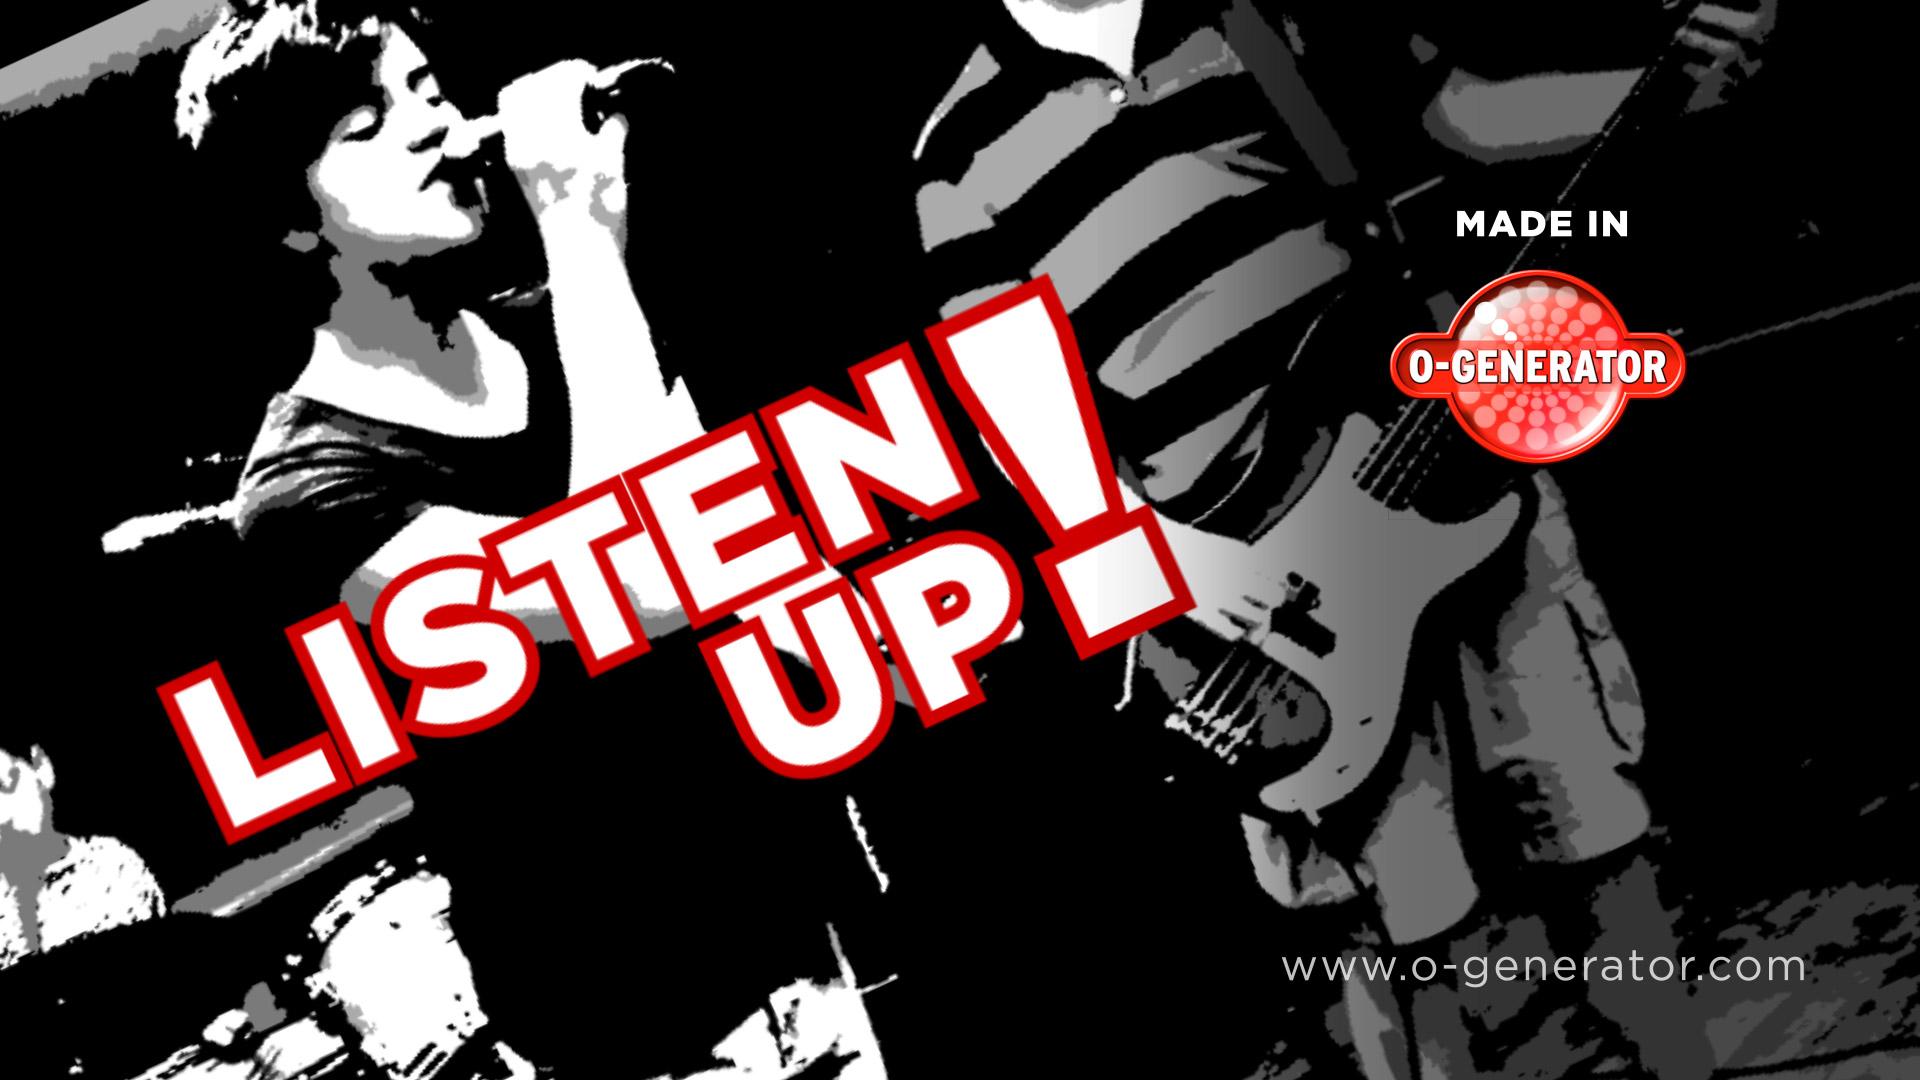 Listen Up - O-Generator